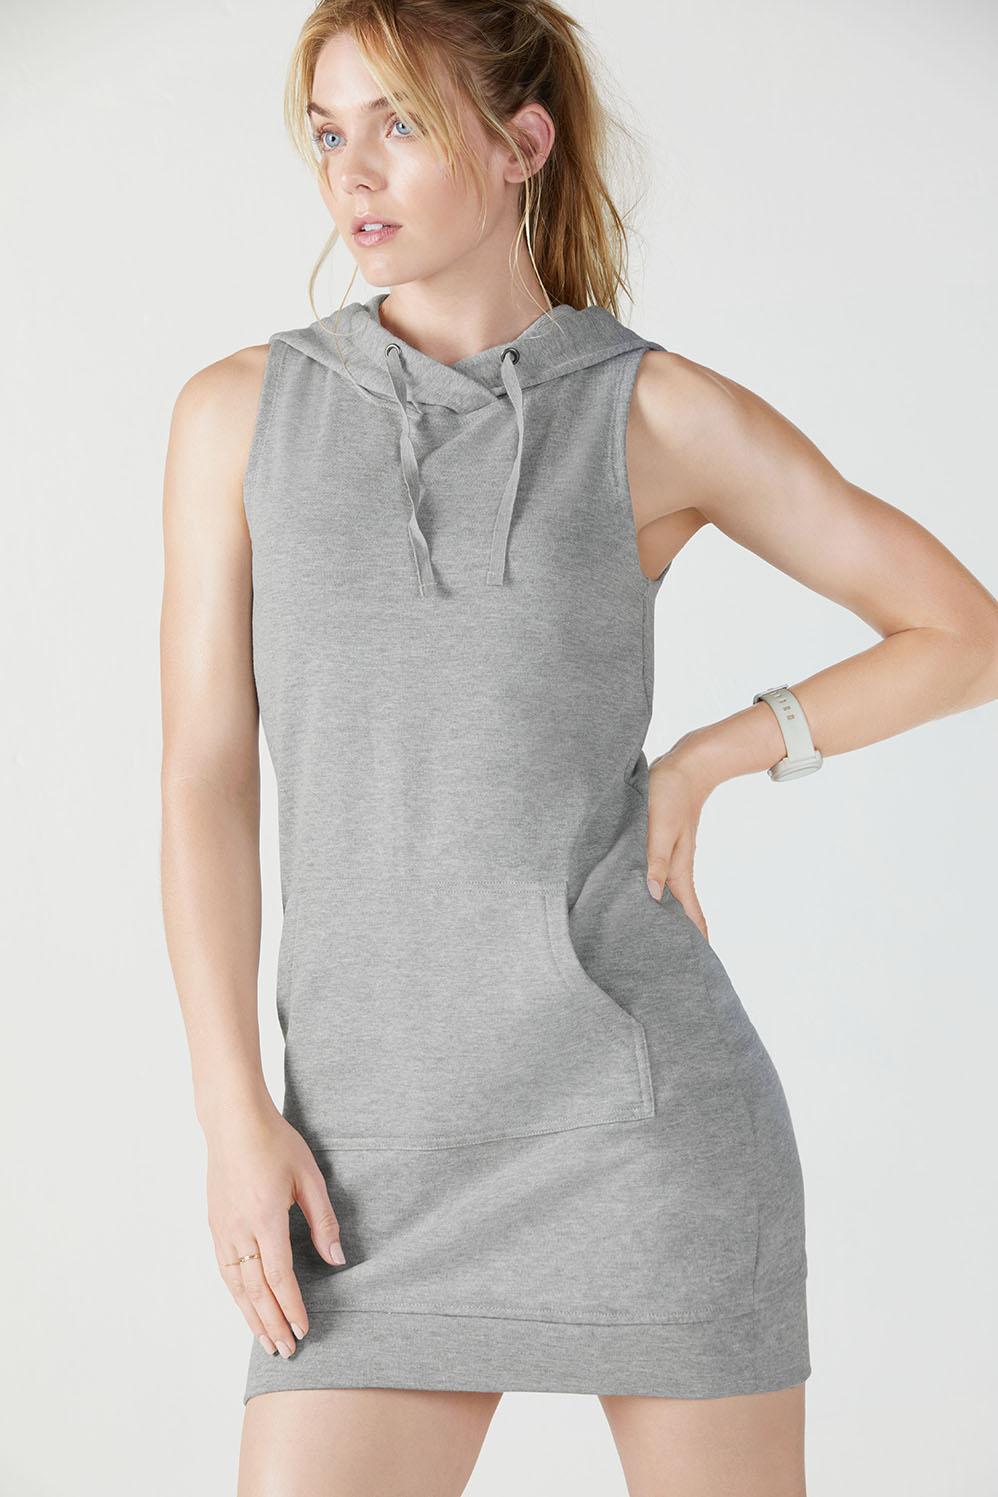 b8565a23eb Yukon Sleeveless Dress - Grey Heather